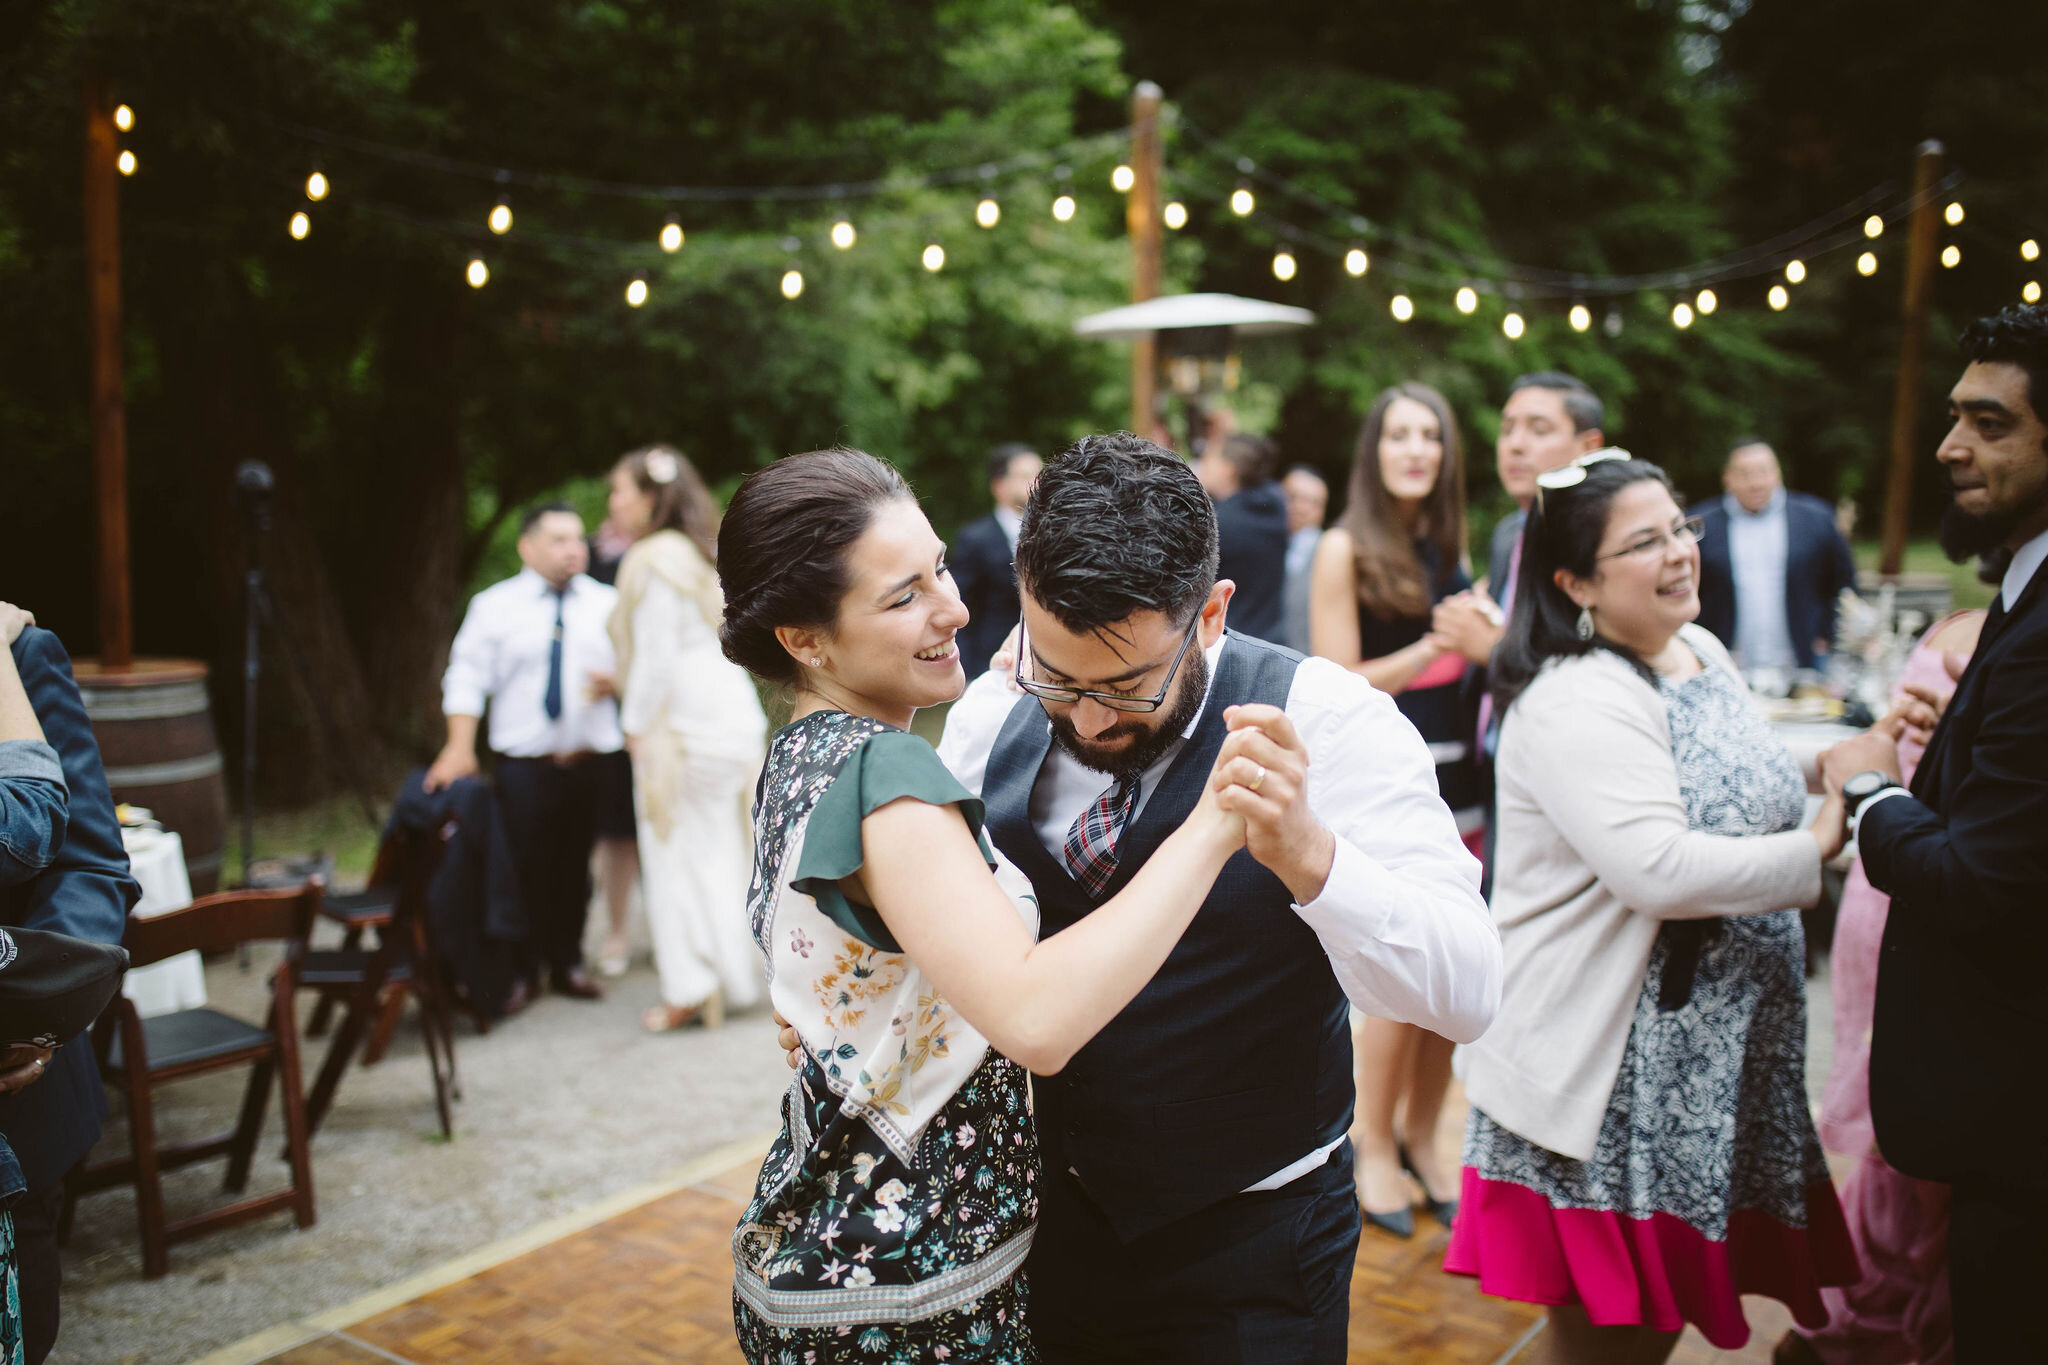 Venture-Retreat-Center-Wedding-Pescadero-Sat-Aaron-Pritam-The-Shalom-Imaginative-717.jpg